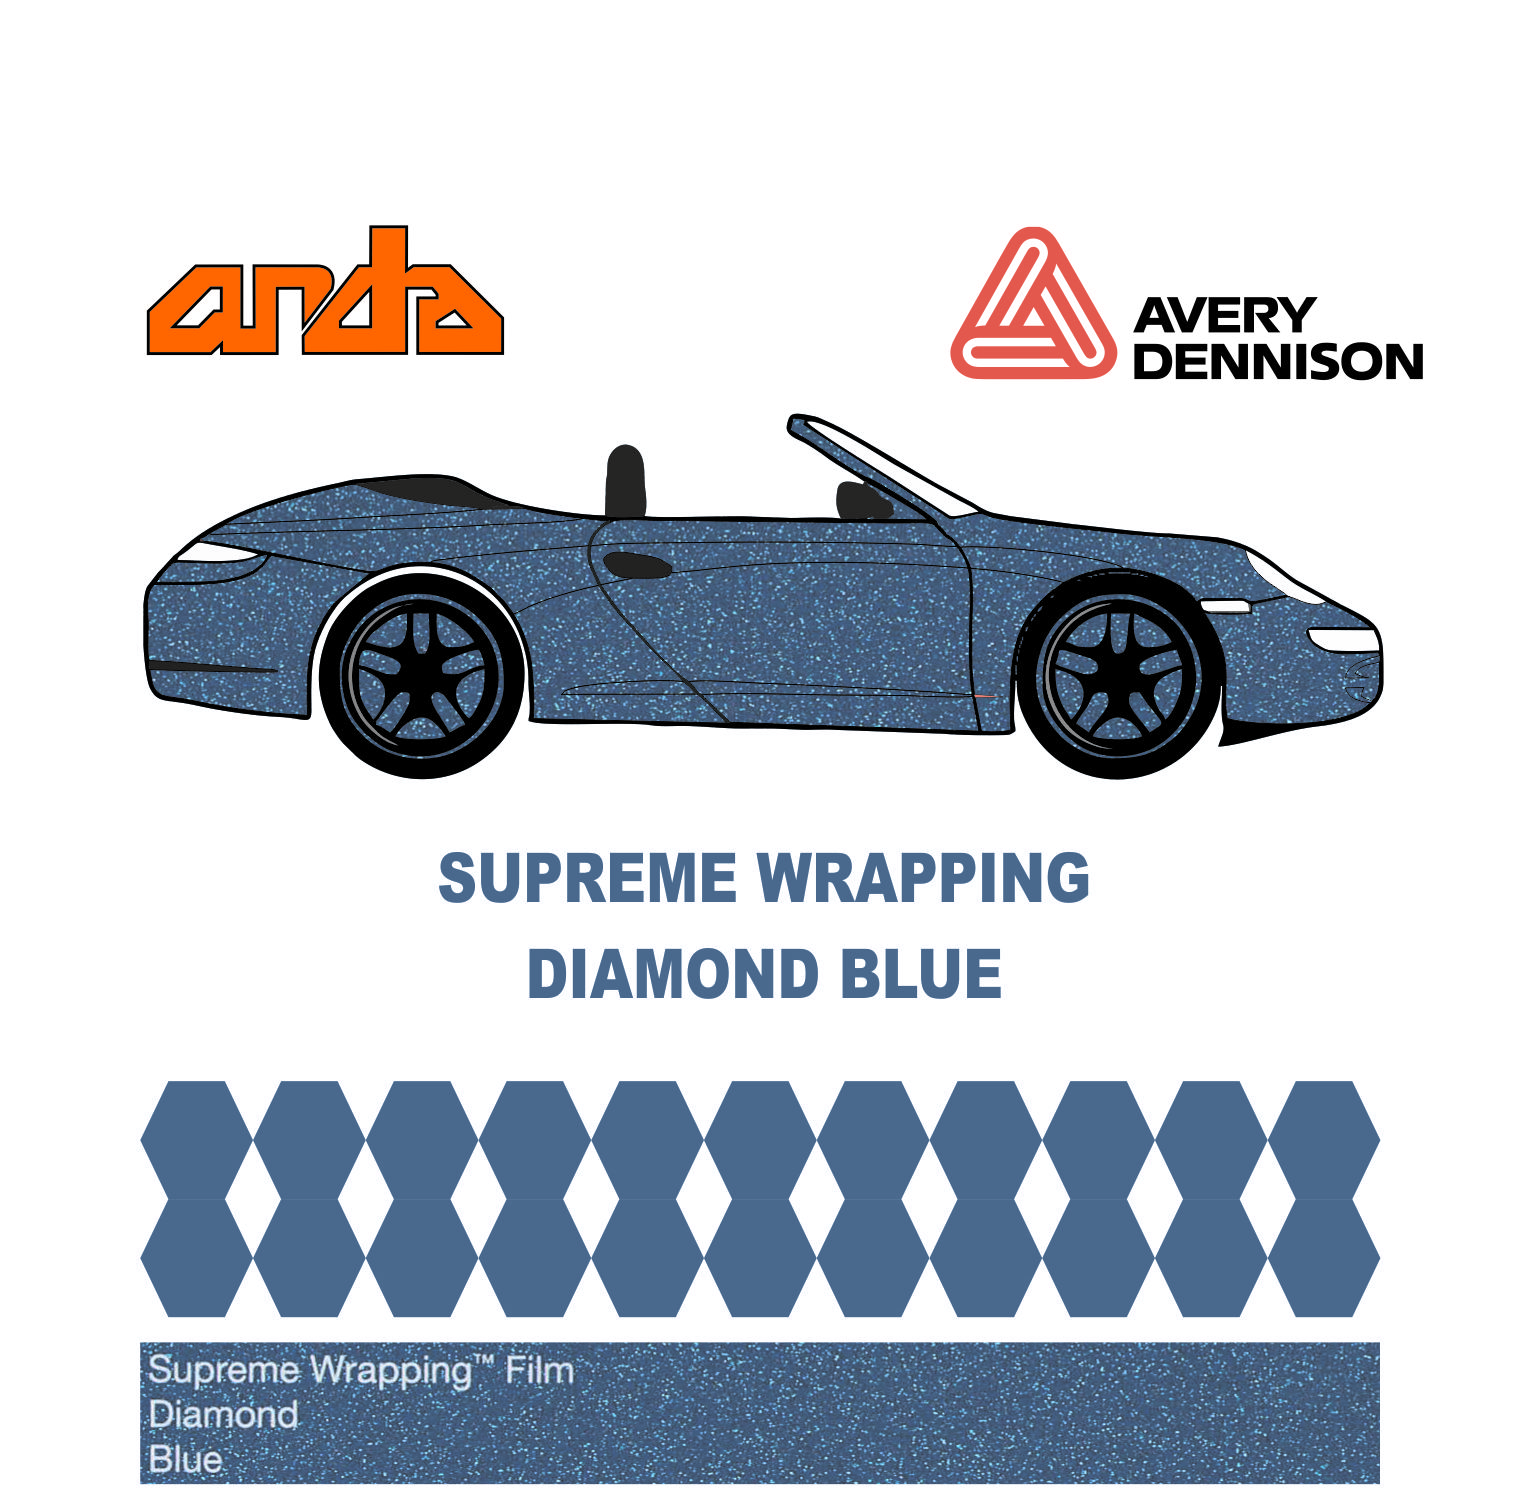 Avery Dennison- SWF Diamond Blue 1